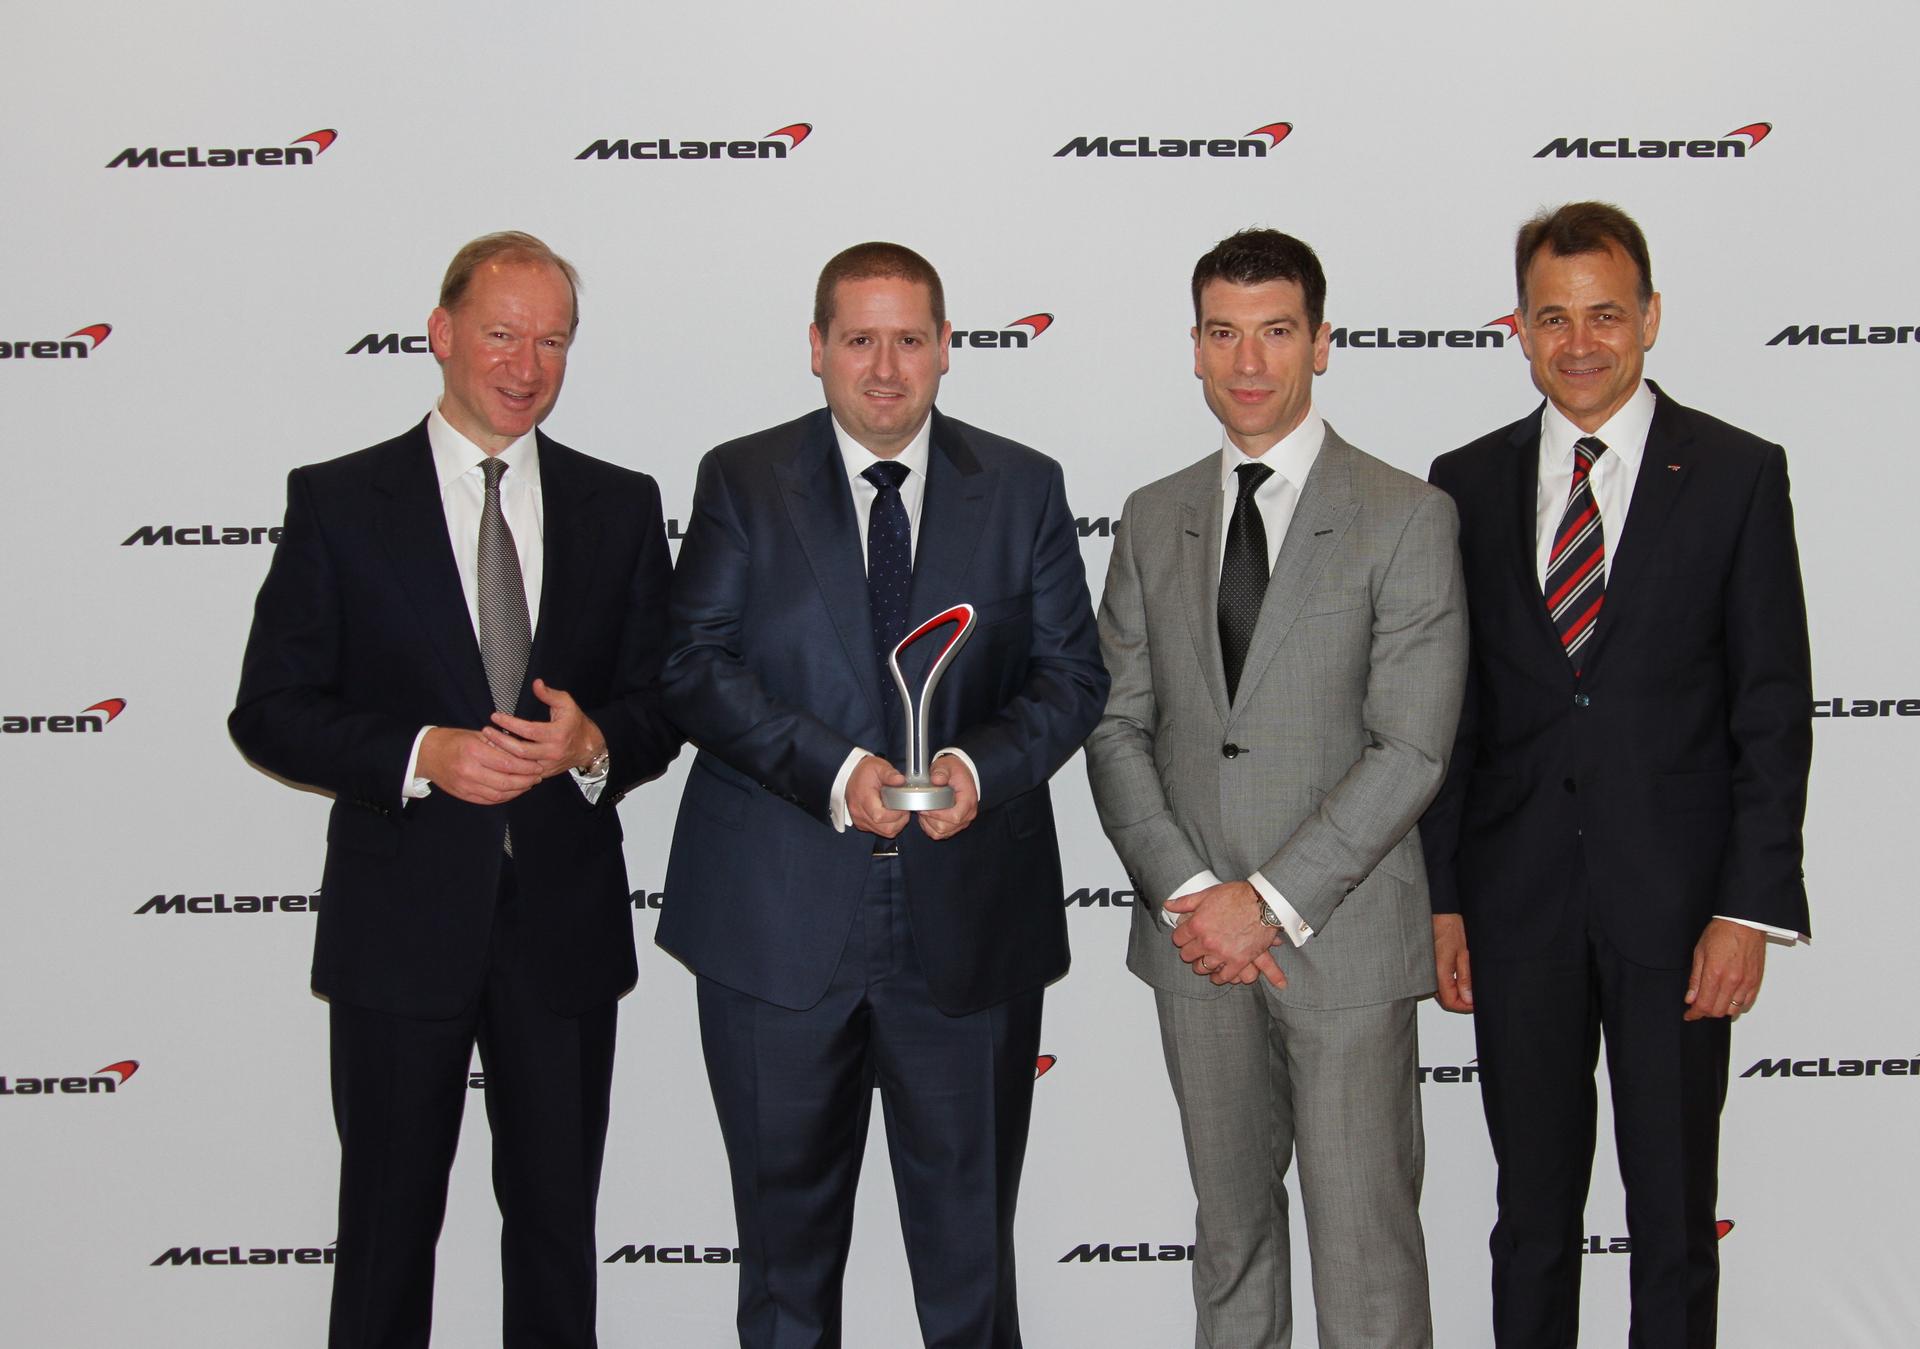 McLaren Glasgow named McLaren Global Retailer of the Year 2015 © McLaren Automotive